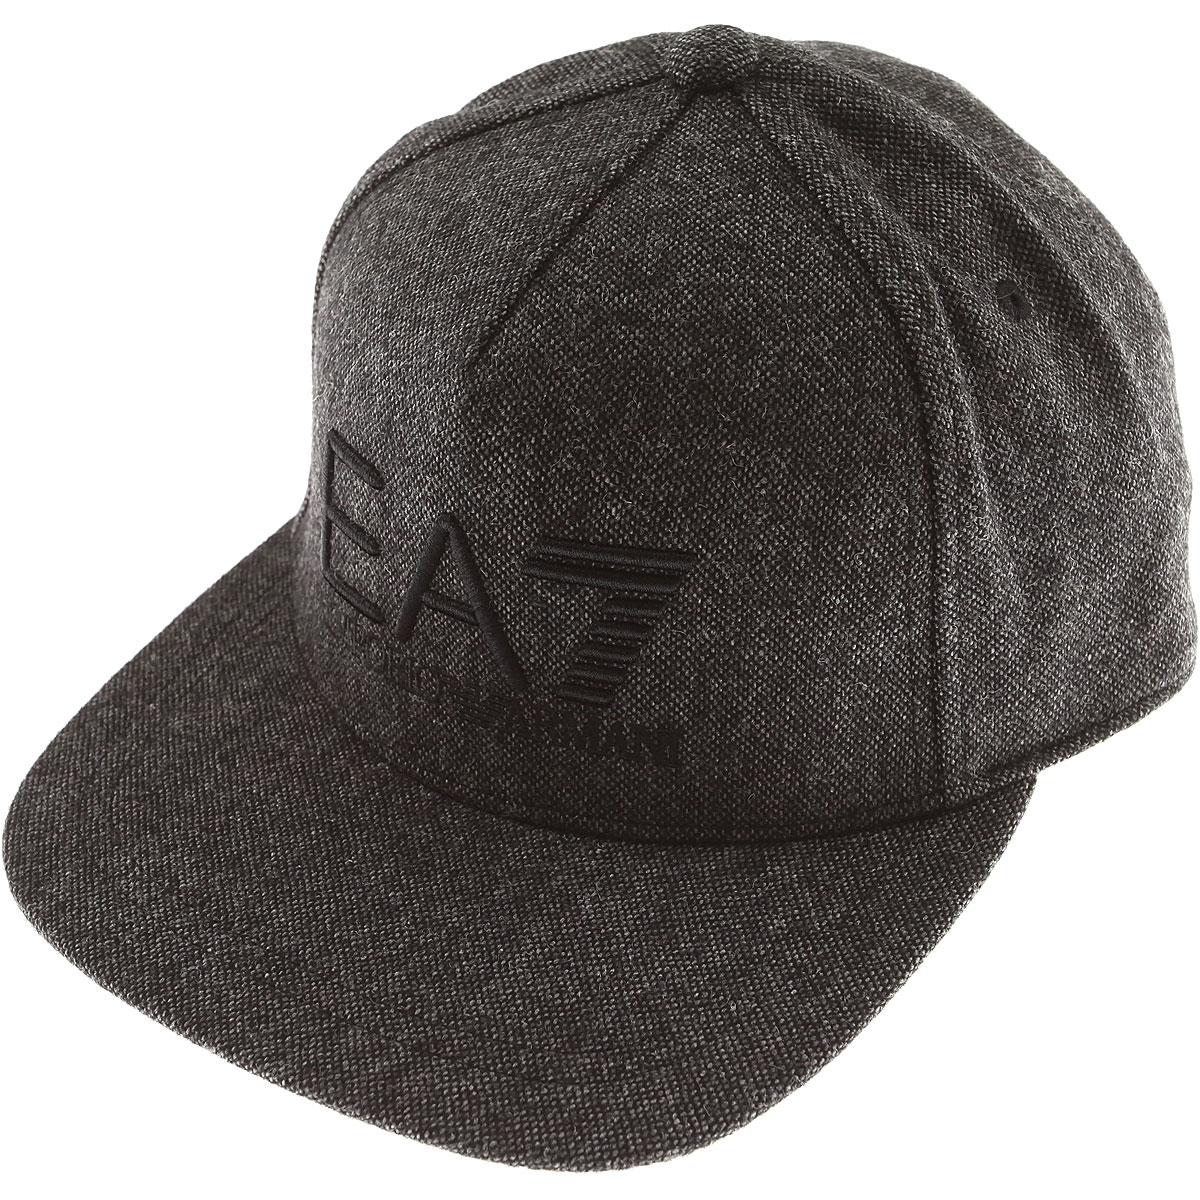 c86ed6b1 Mens Clothing Emporio Armani, Style code: 275727-8a895-08749